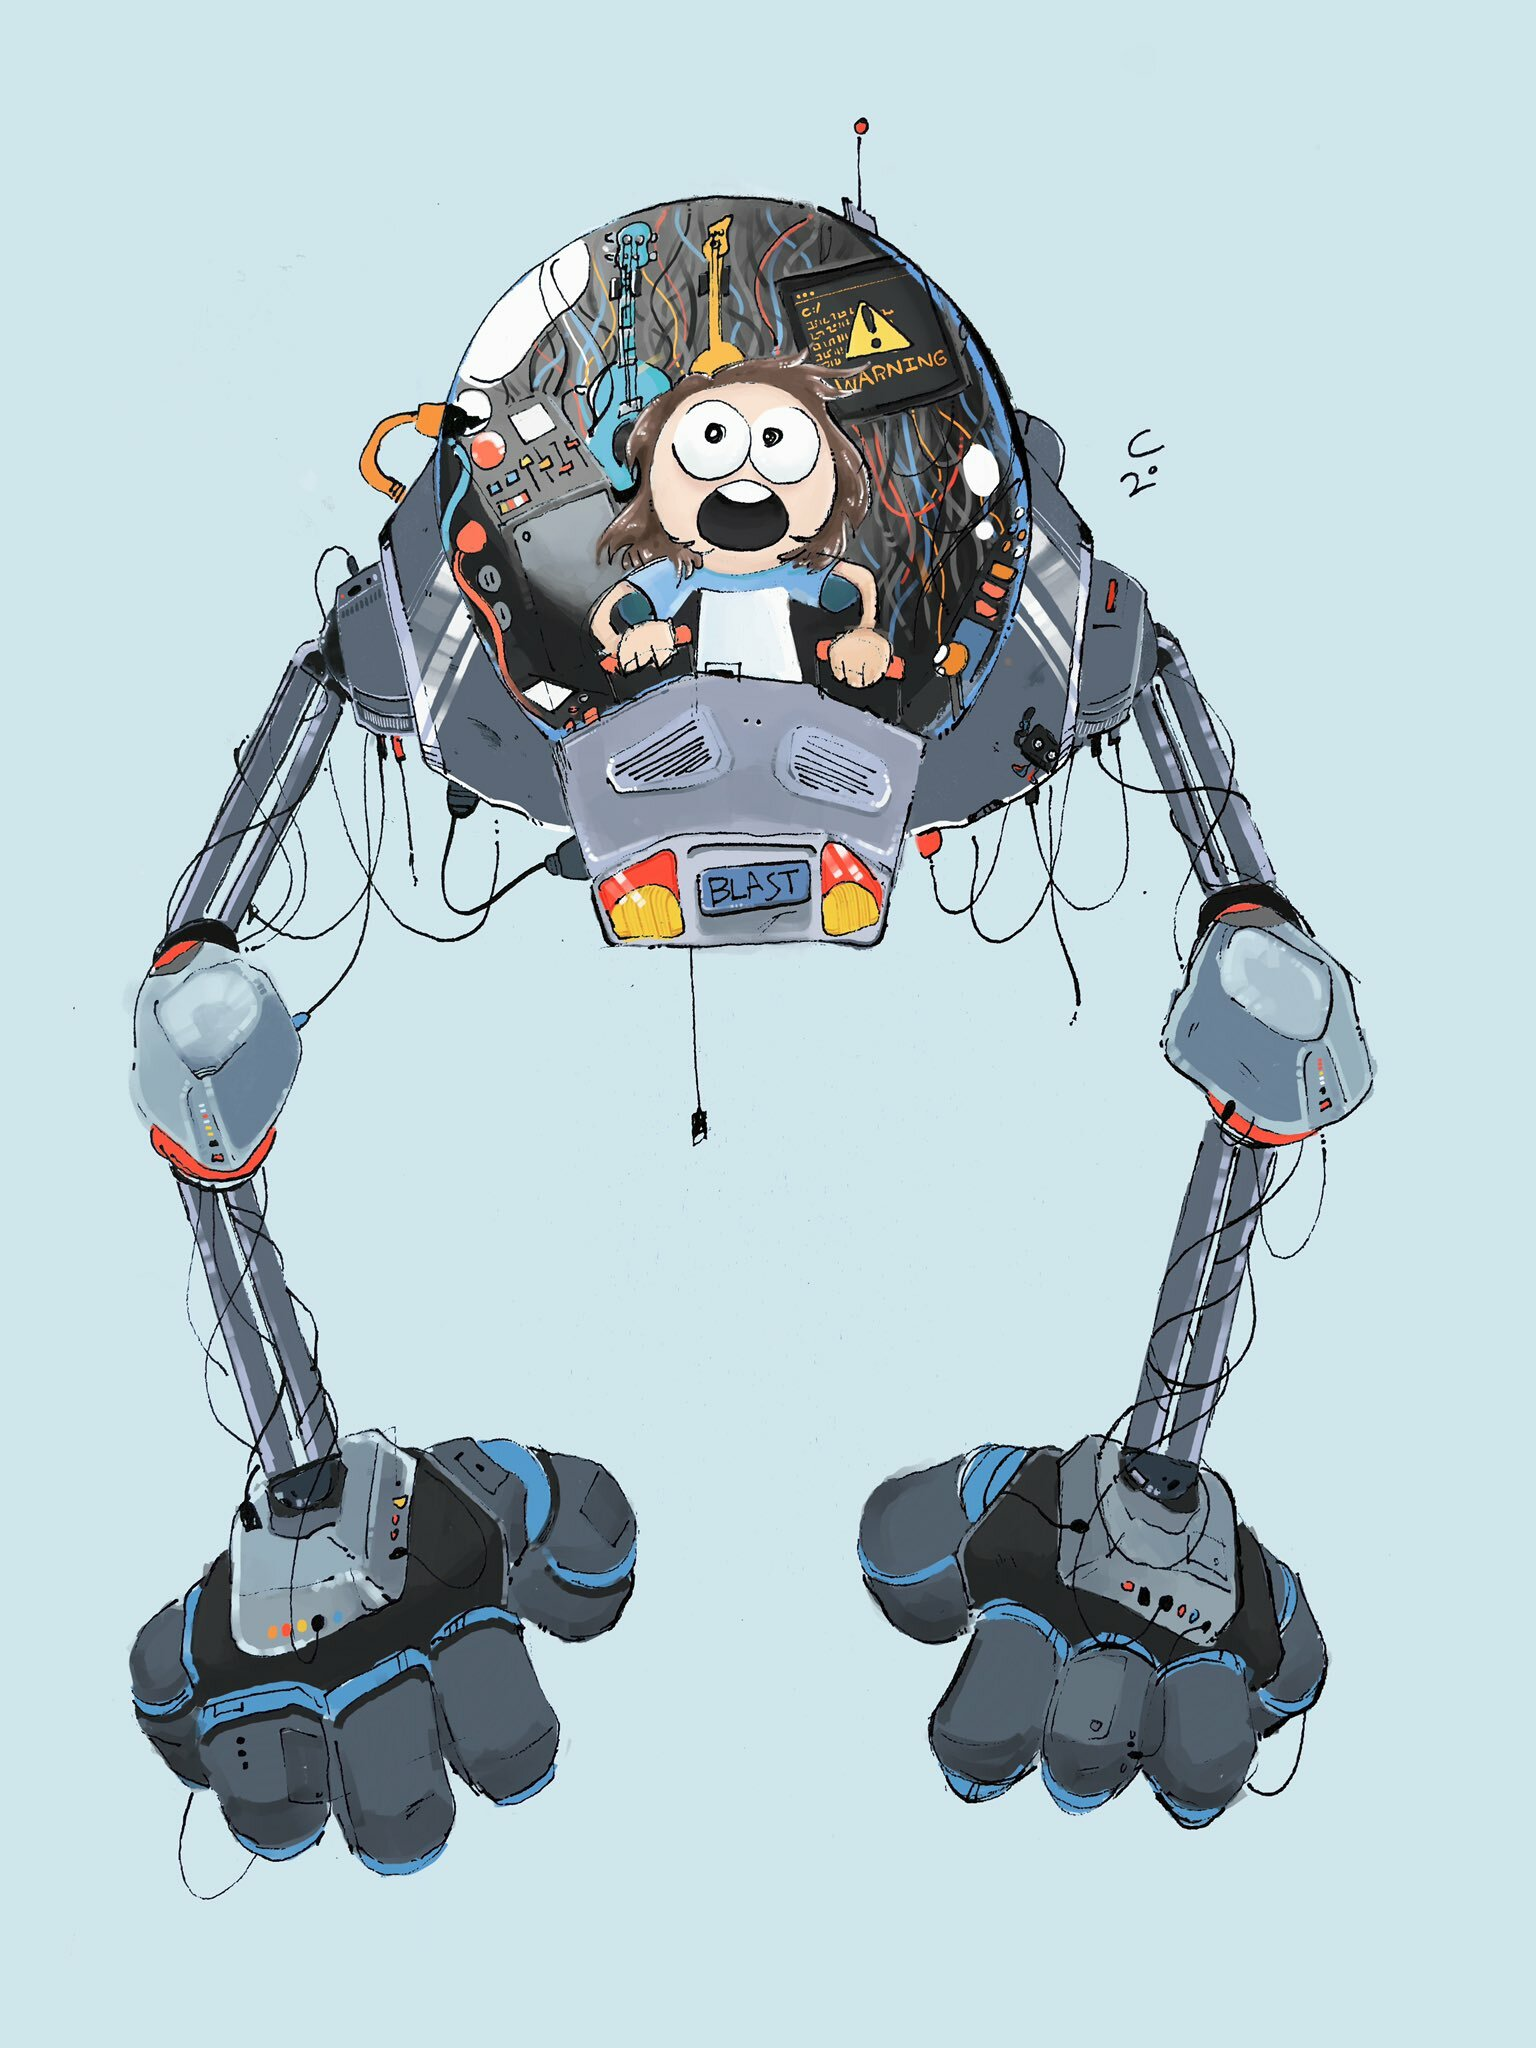 Blast-bot